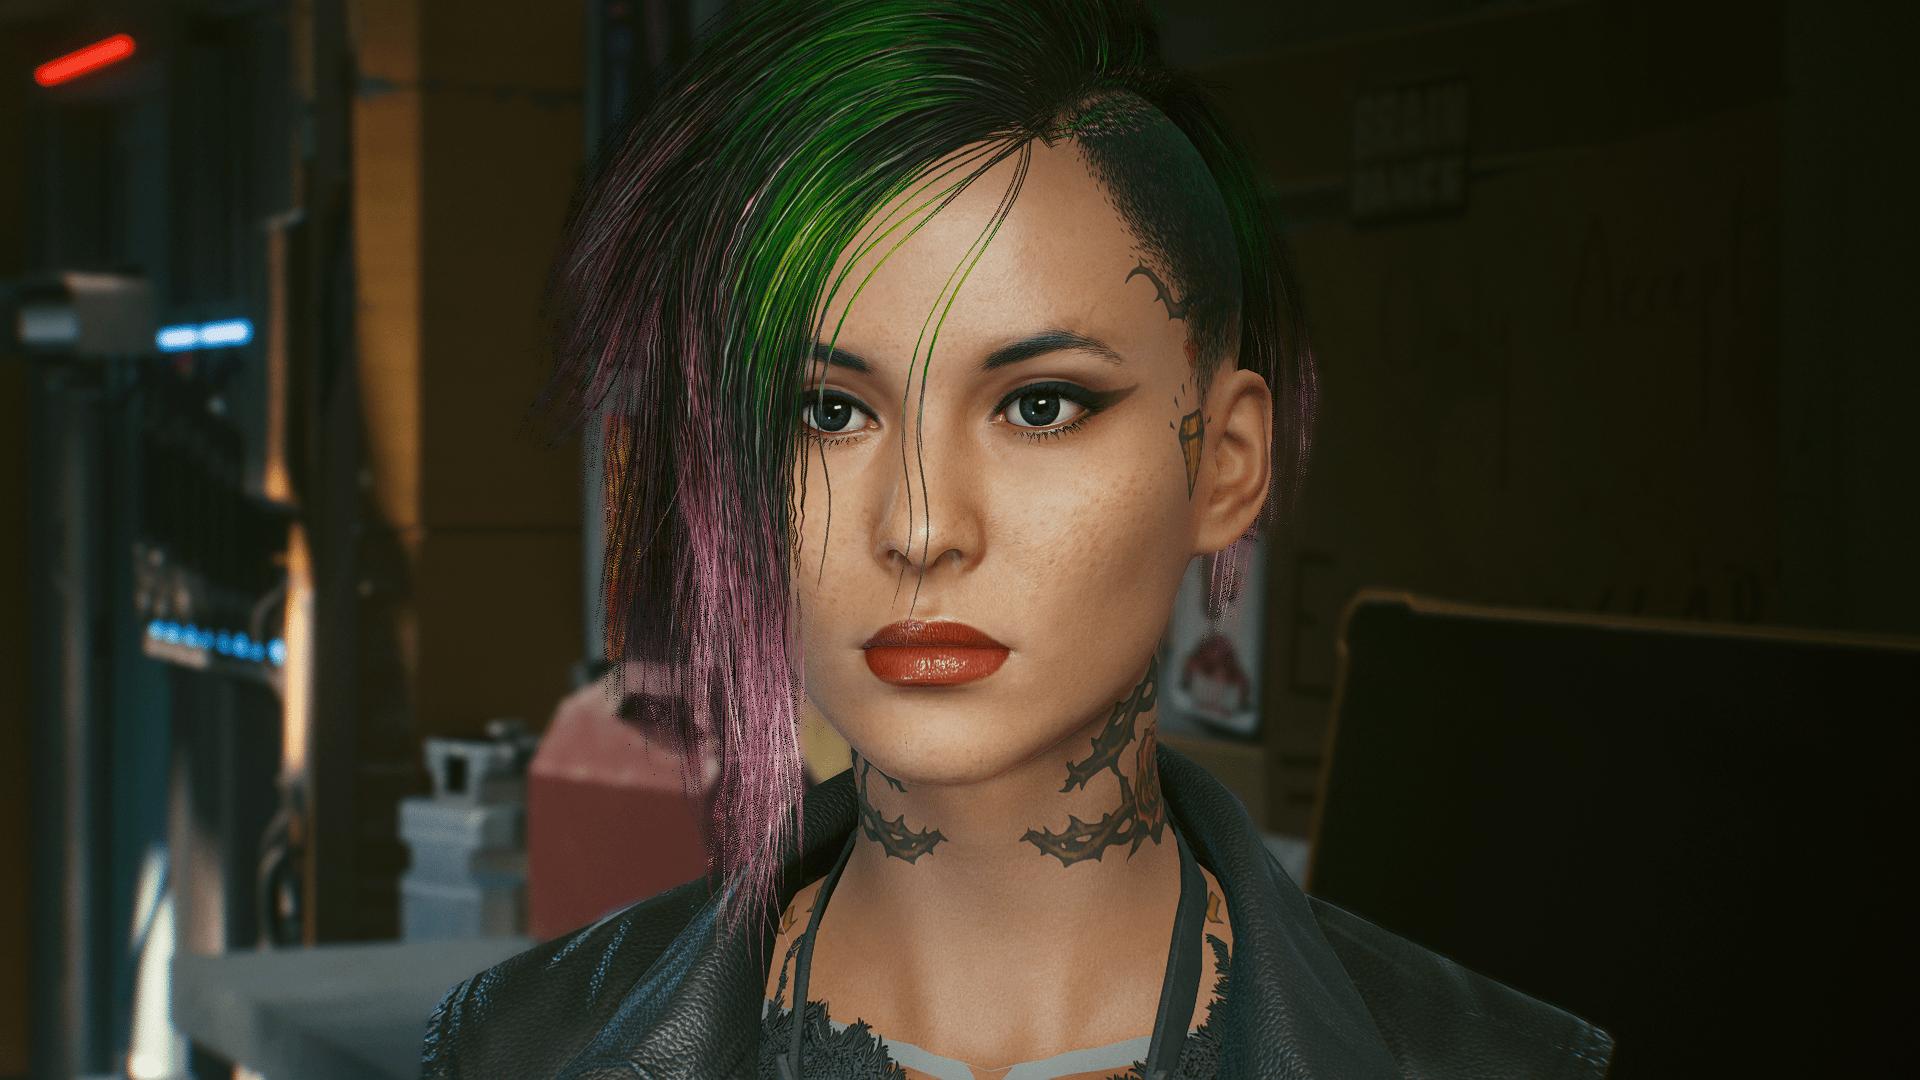 V judy Preset (CyberCAT) - Cyberpunk 2077 Mod